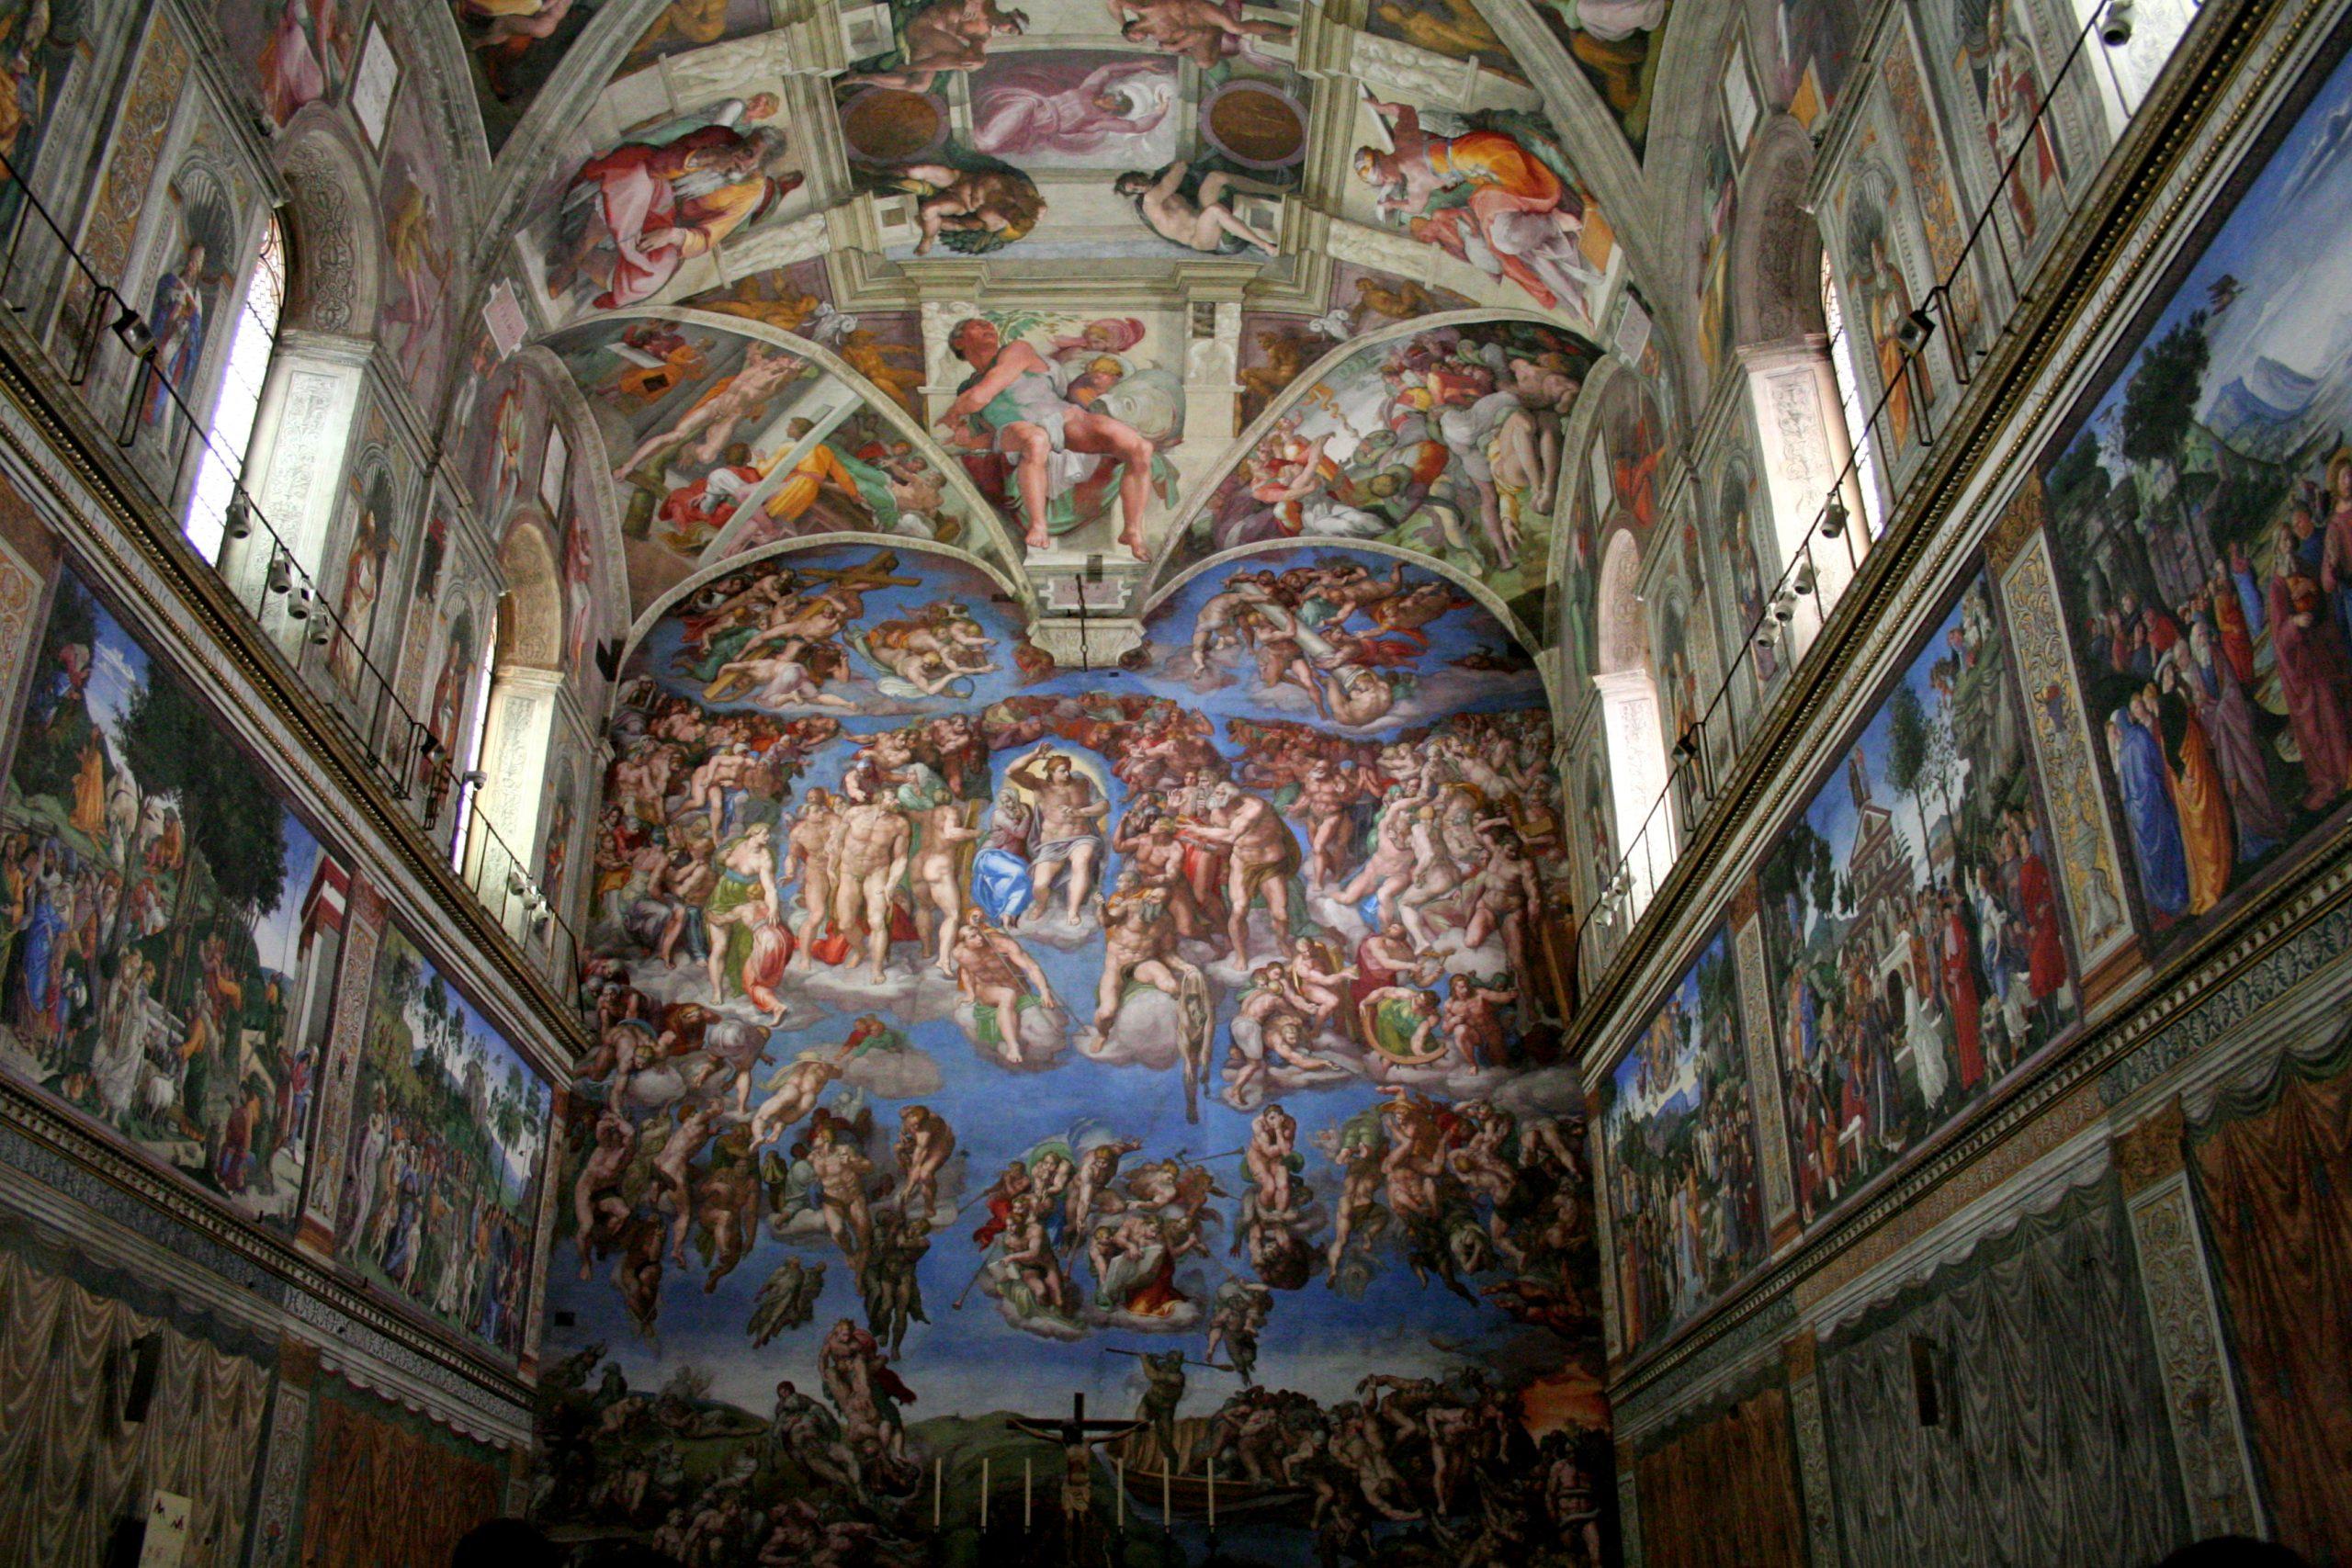 2007, Sistine Chapel, Vatican City, Italy